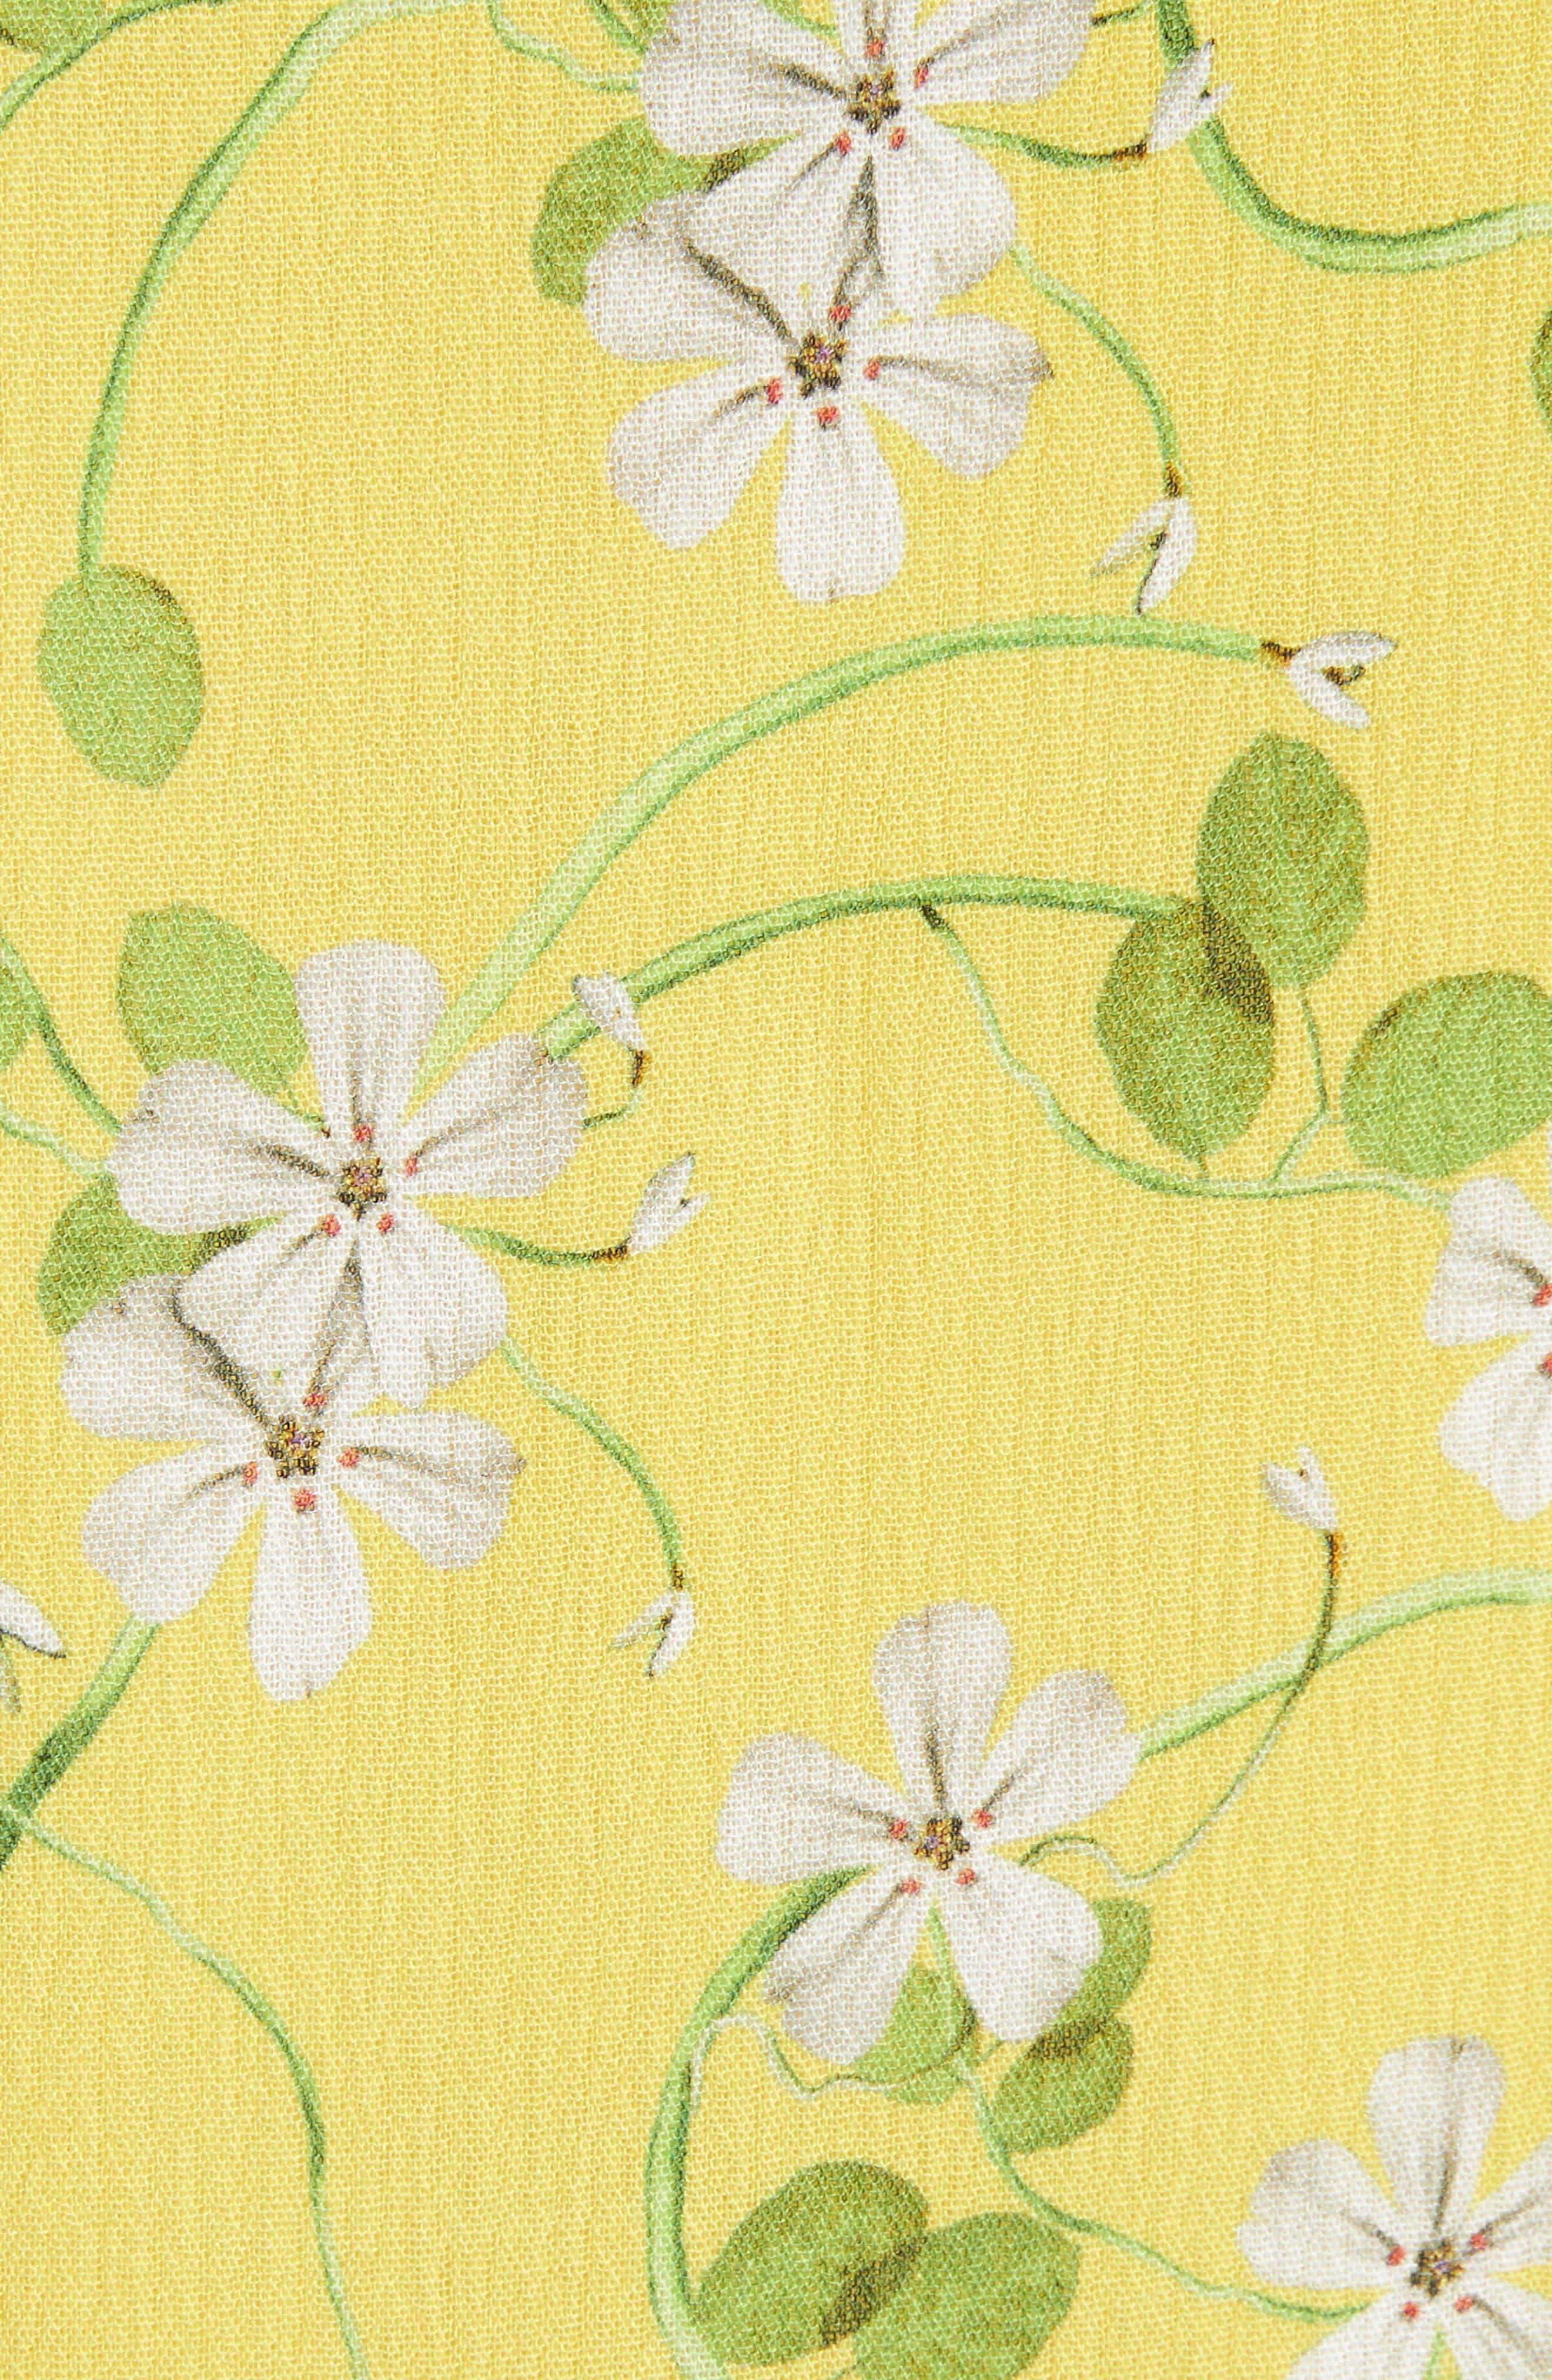 Moore Flutter Sleeve Layered Tunic Dress,                             Alternate thumbnail 5, color,                             Spring Primrose-Lemon